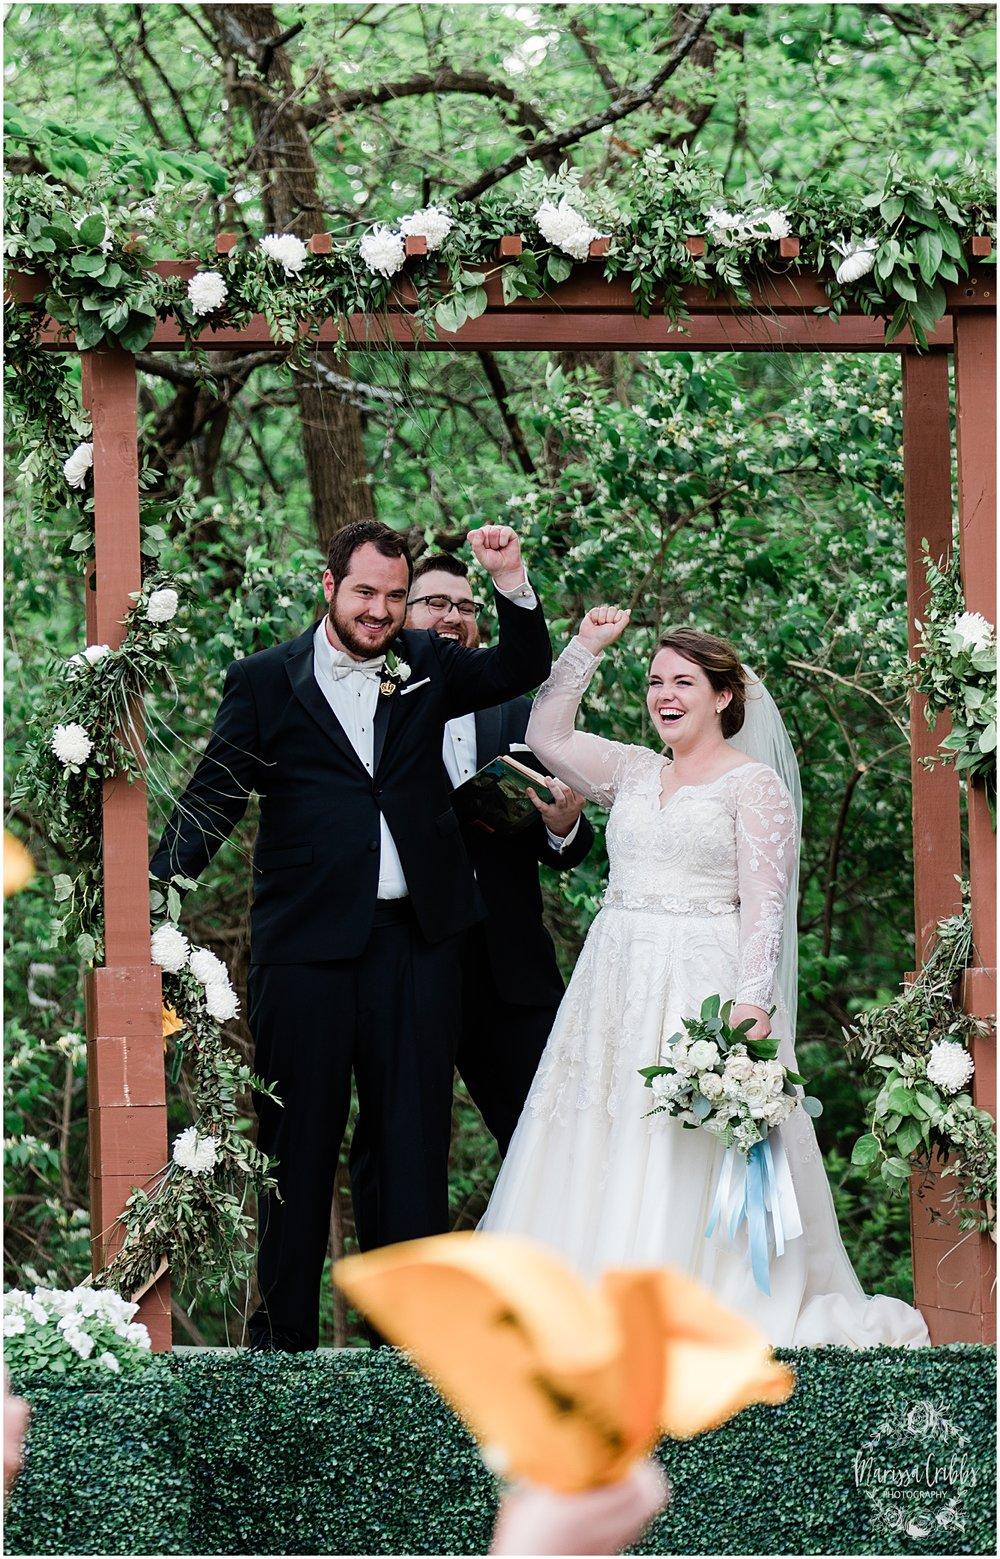 GORBY WEDDING | MARISSA CRIBBS PHOTOGRAPHY_5074.jpg